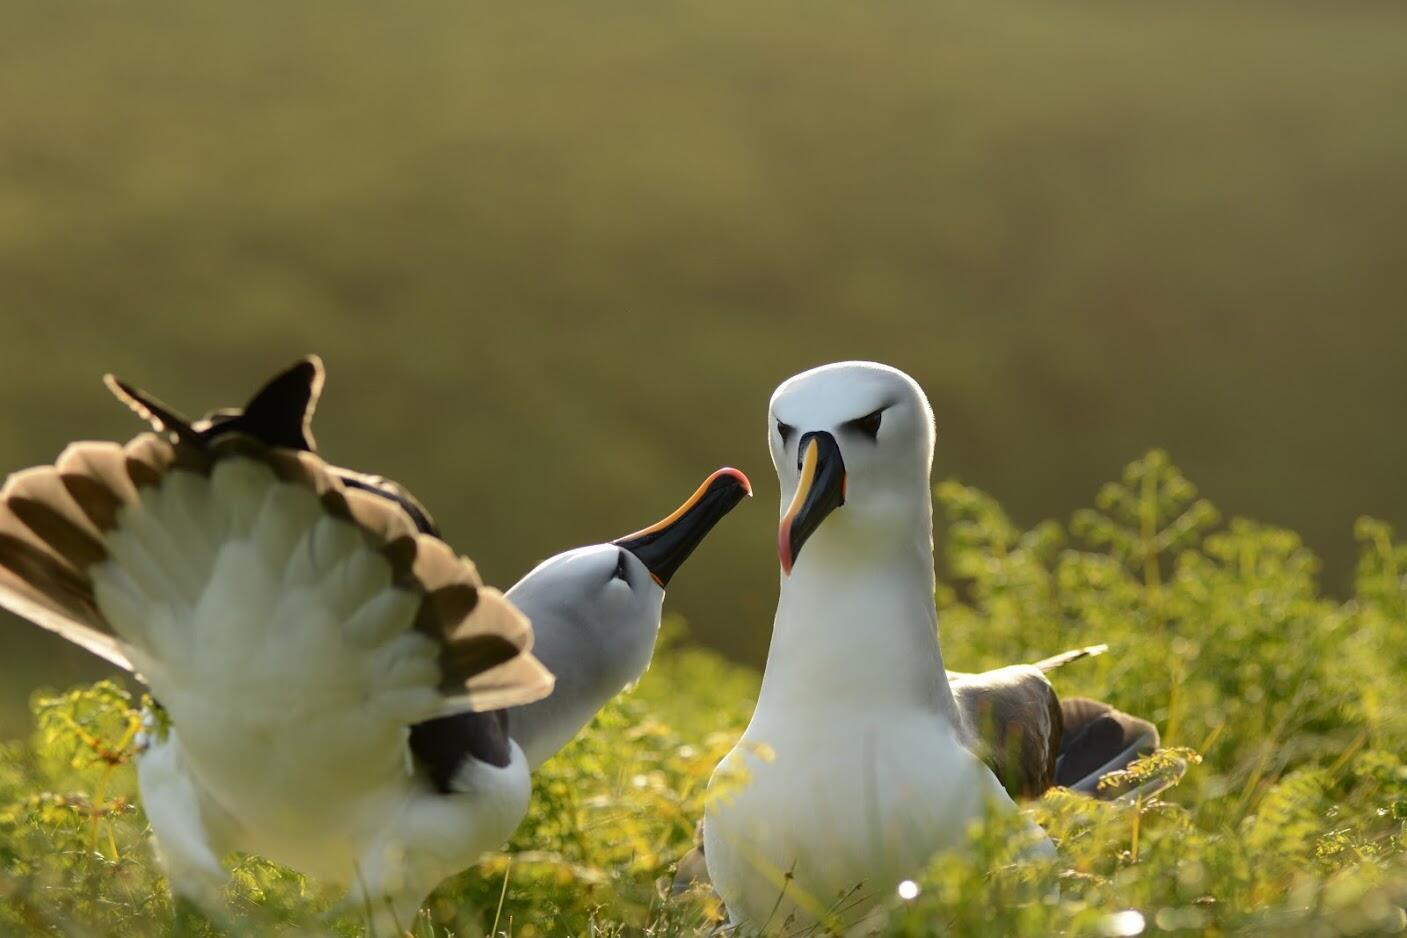 2021-01-14 namibia wildlife birds seabirds yellow-nosed albatross